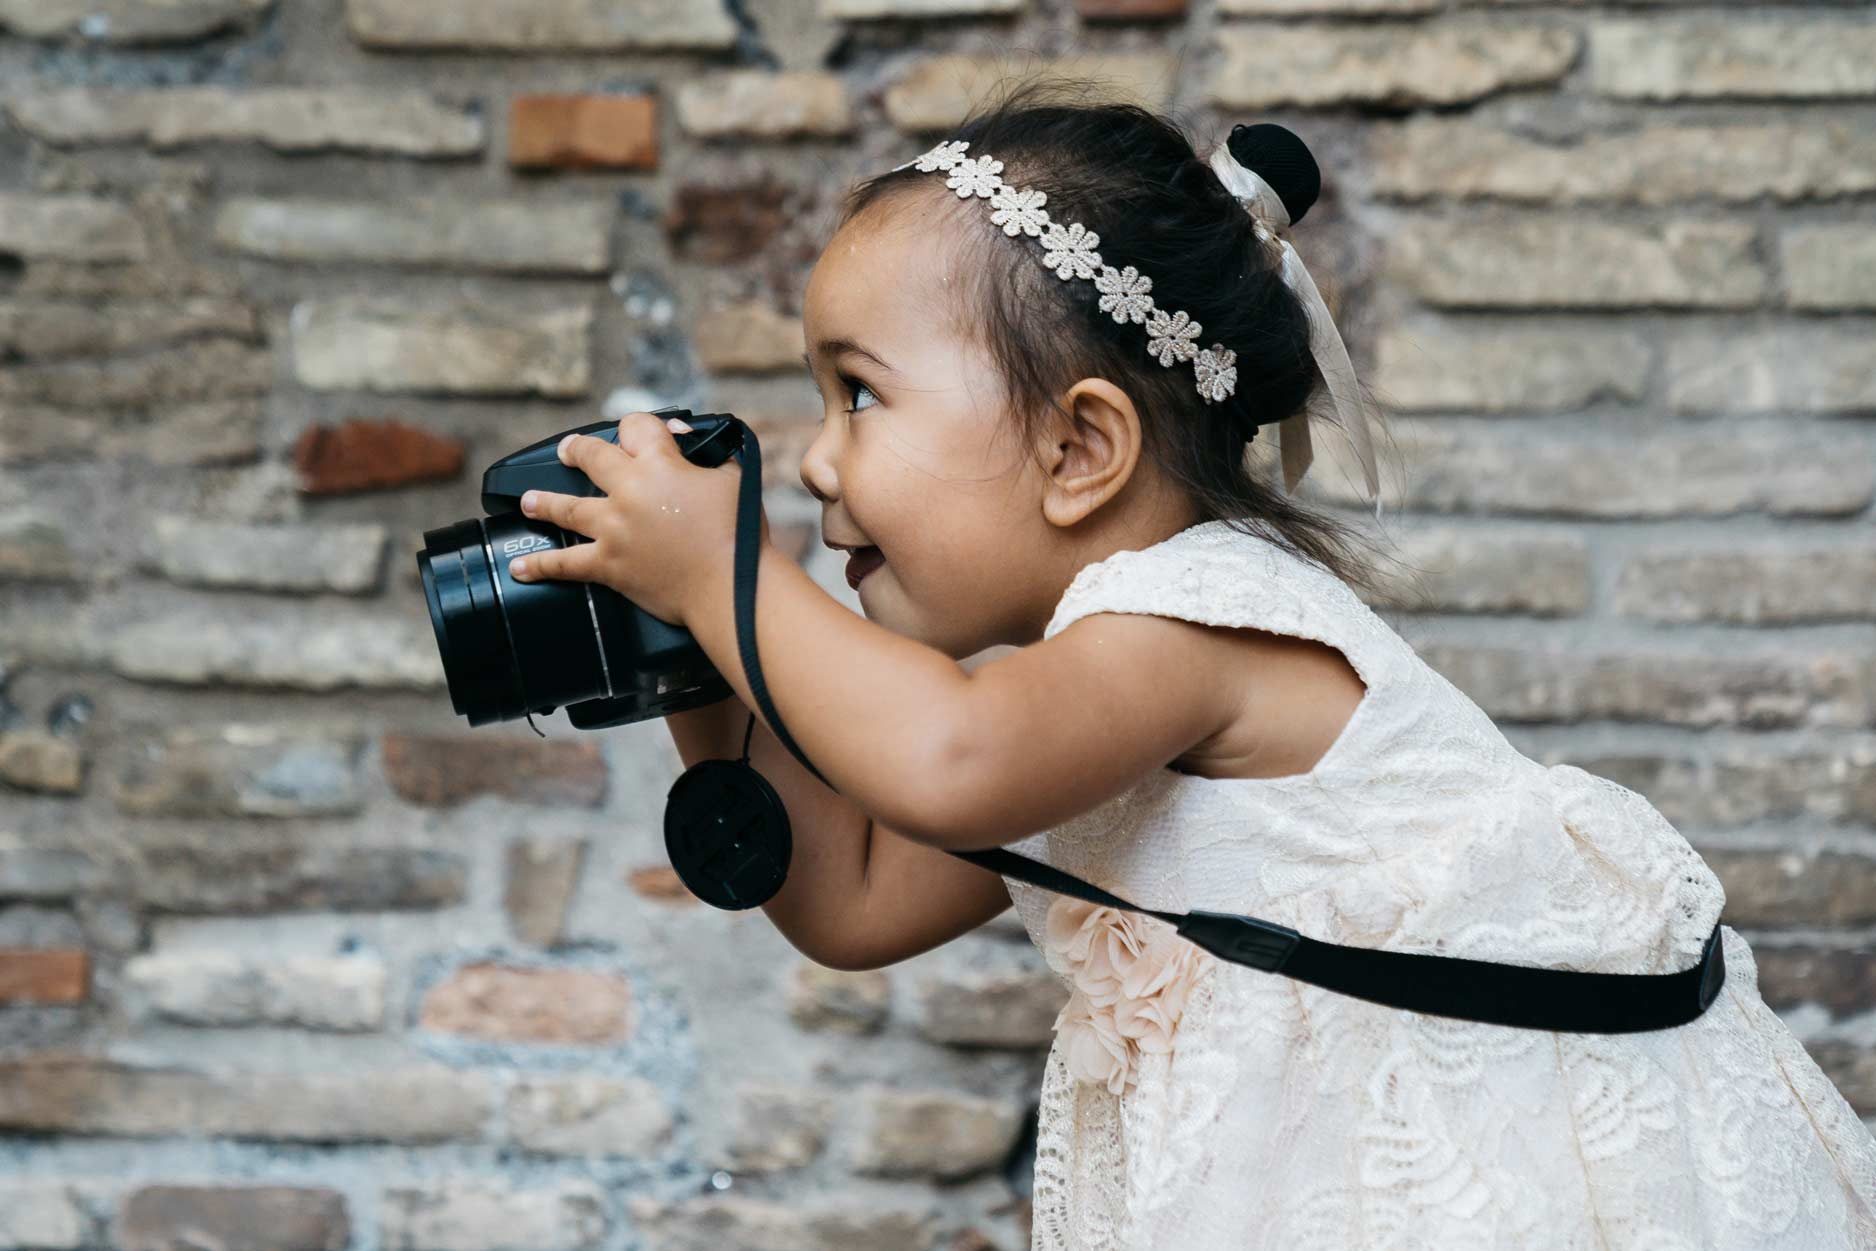 Reportage-Wedding-Photography-Rome-1-Ceremony